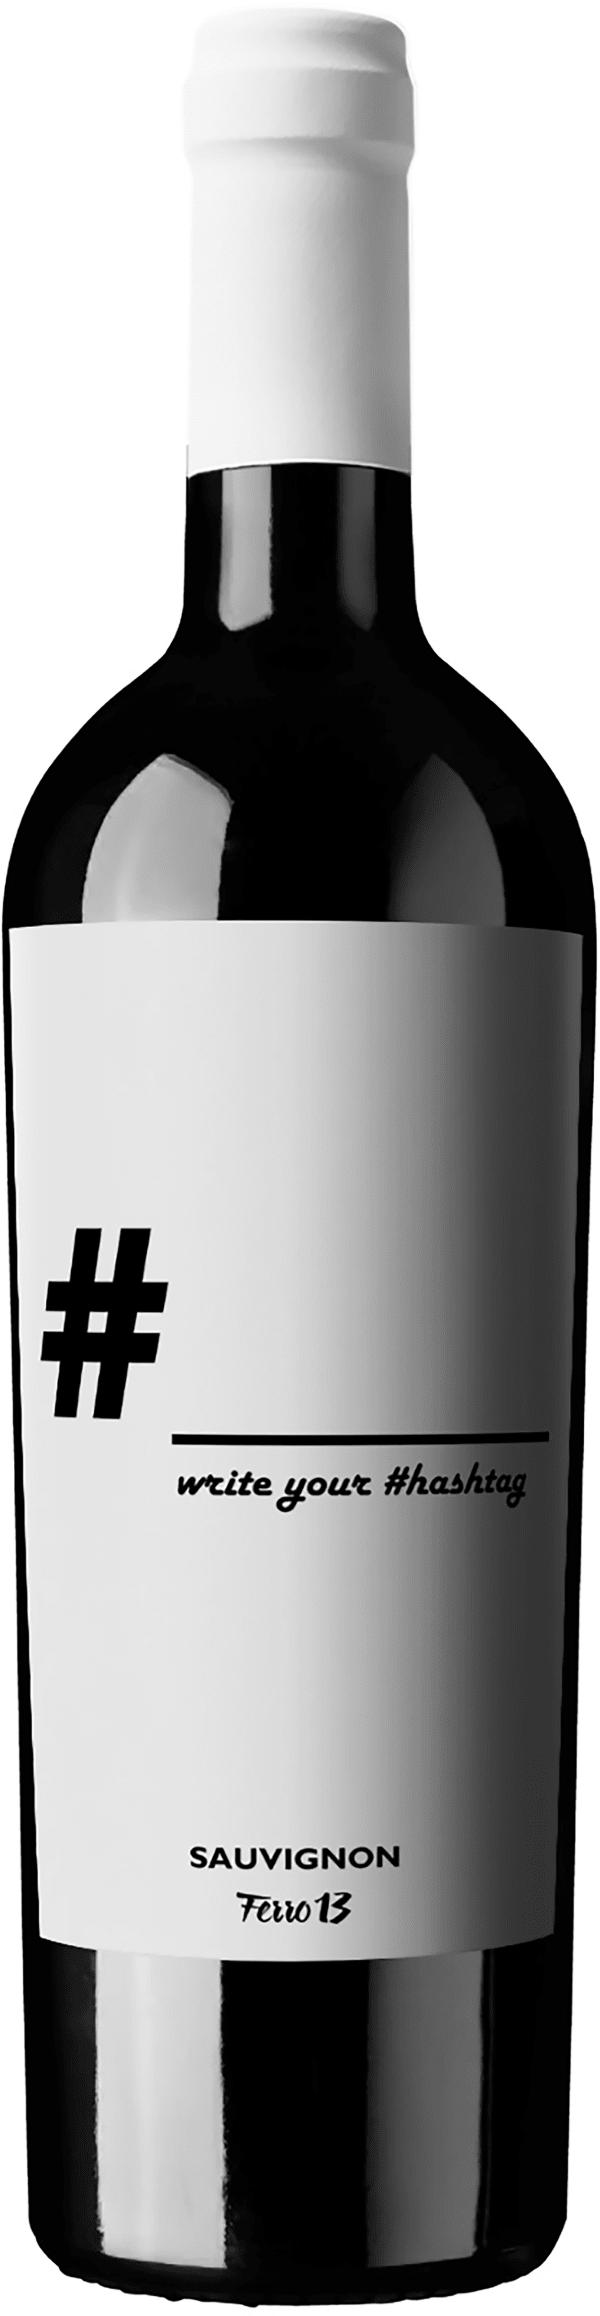 Hashtag Sauvignon 2018